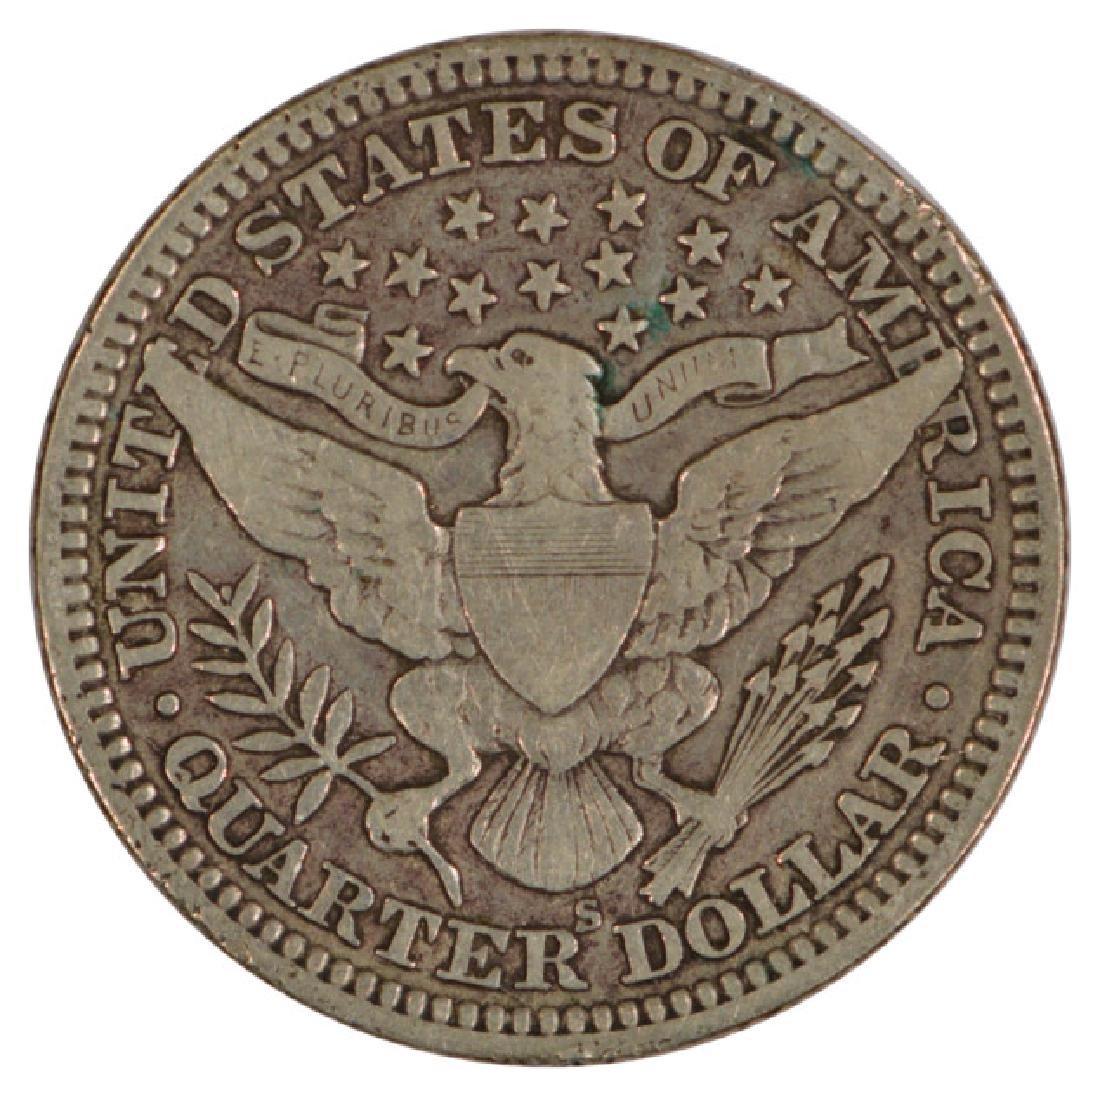 1912-S Barber Quarter Coin - 2